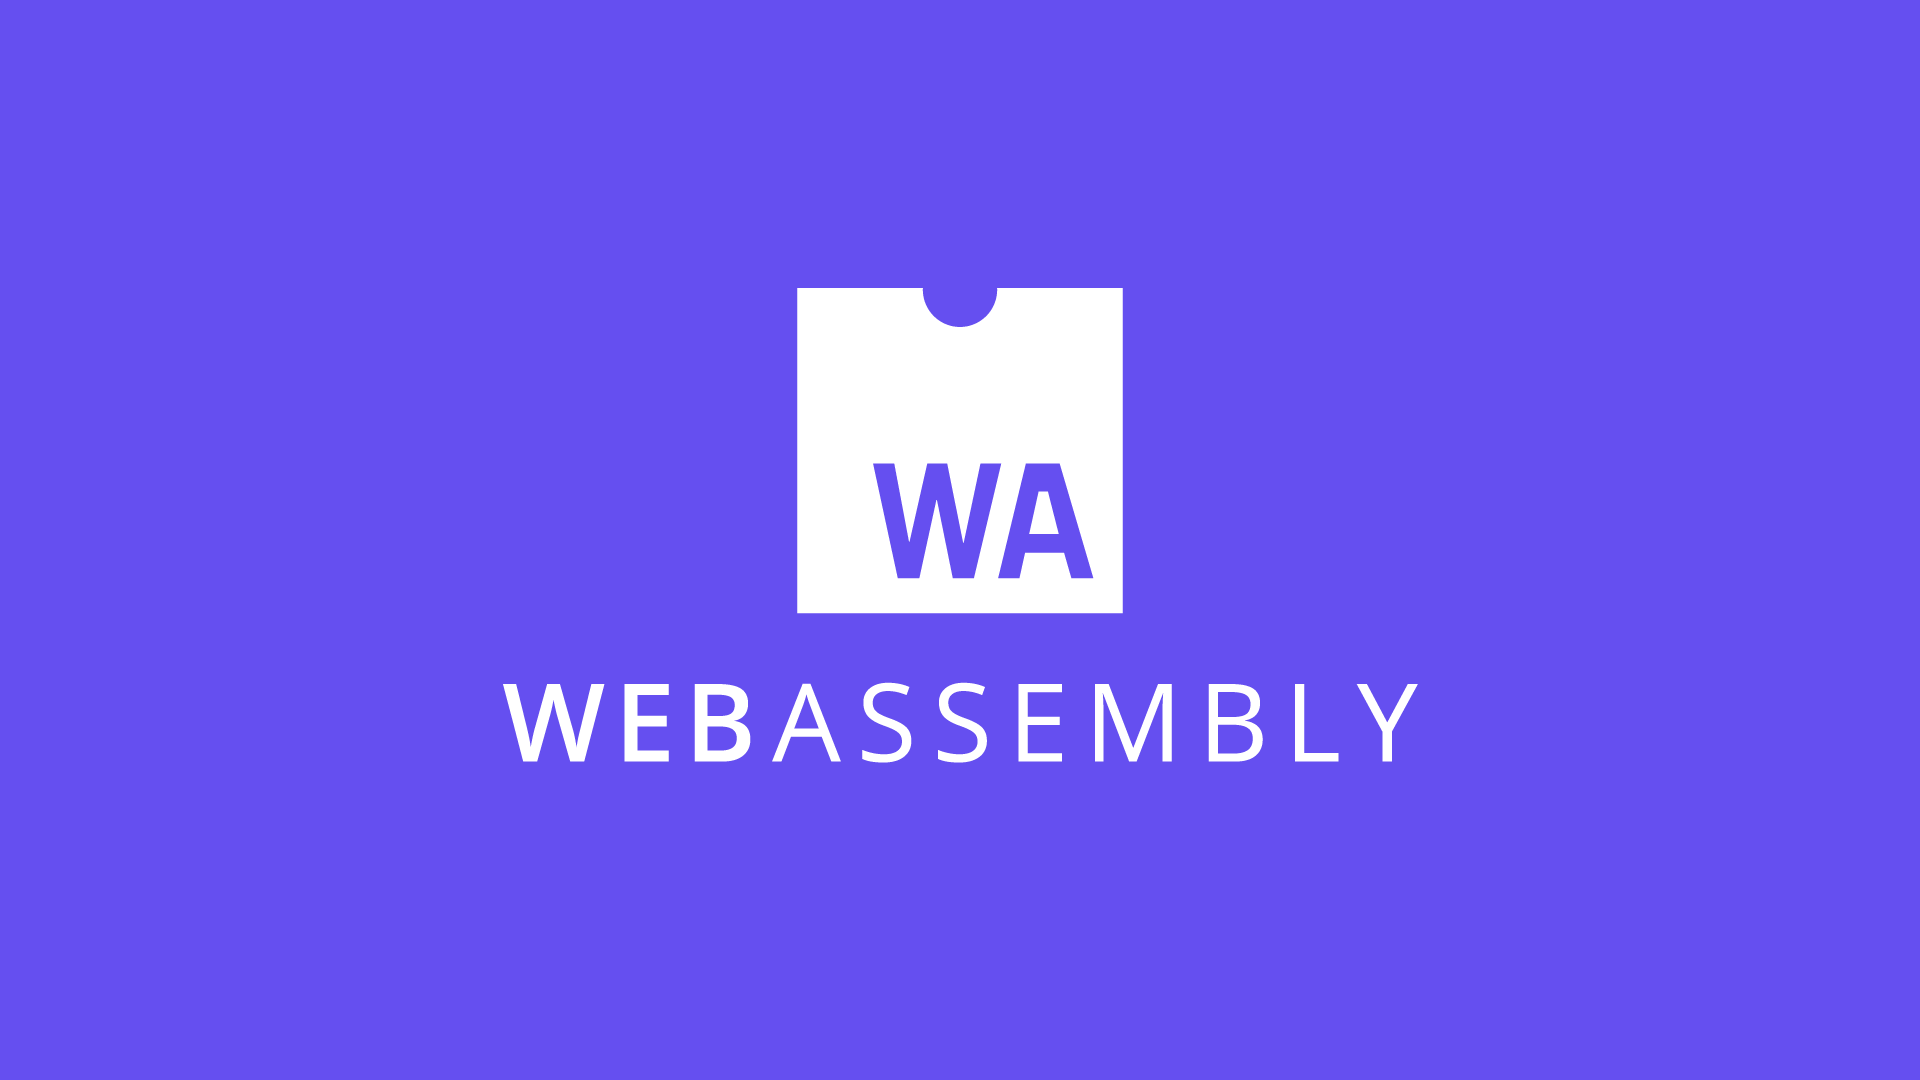 The Webassembly logo